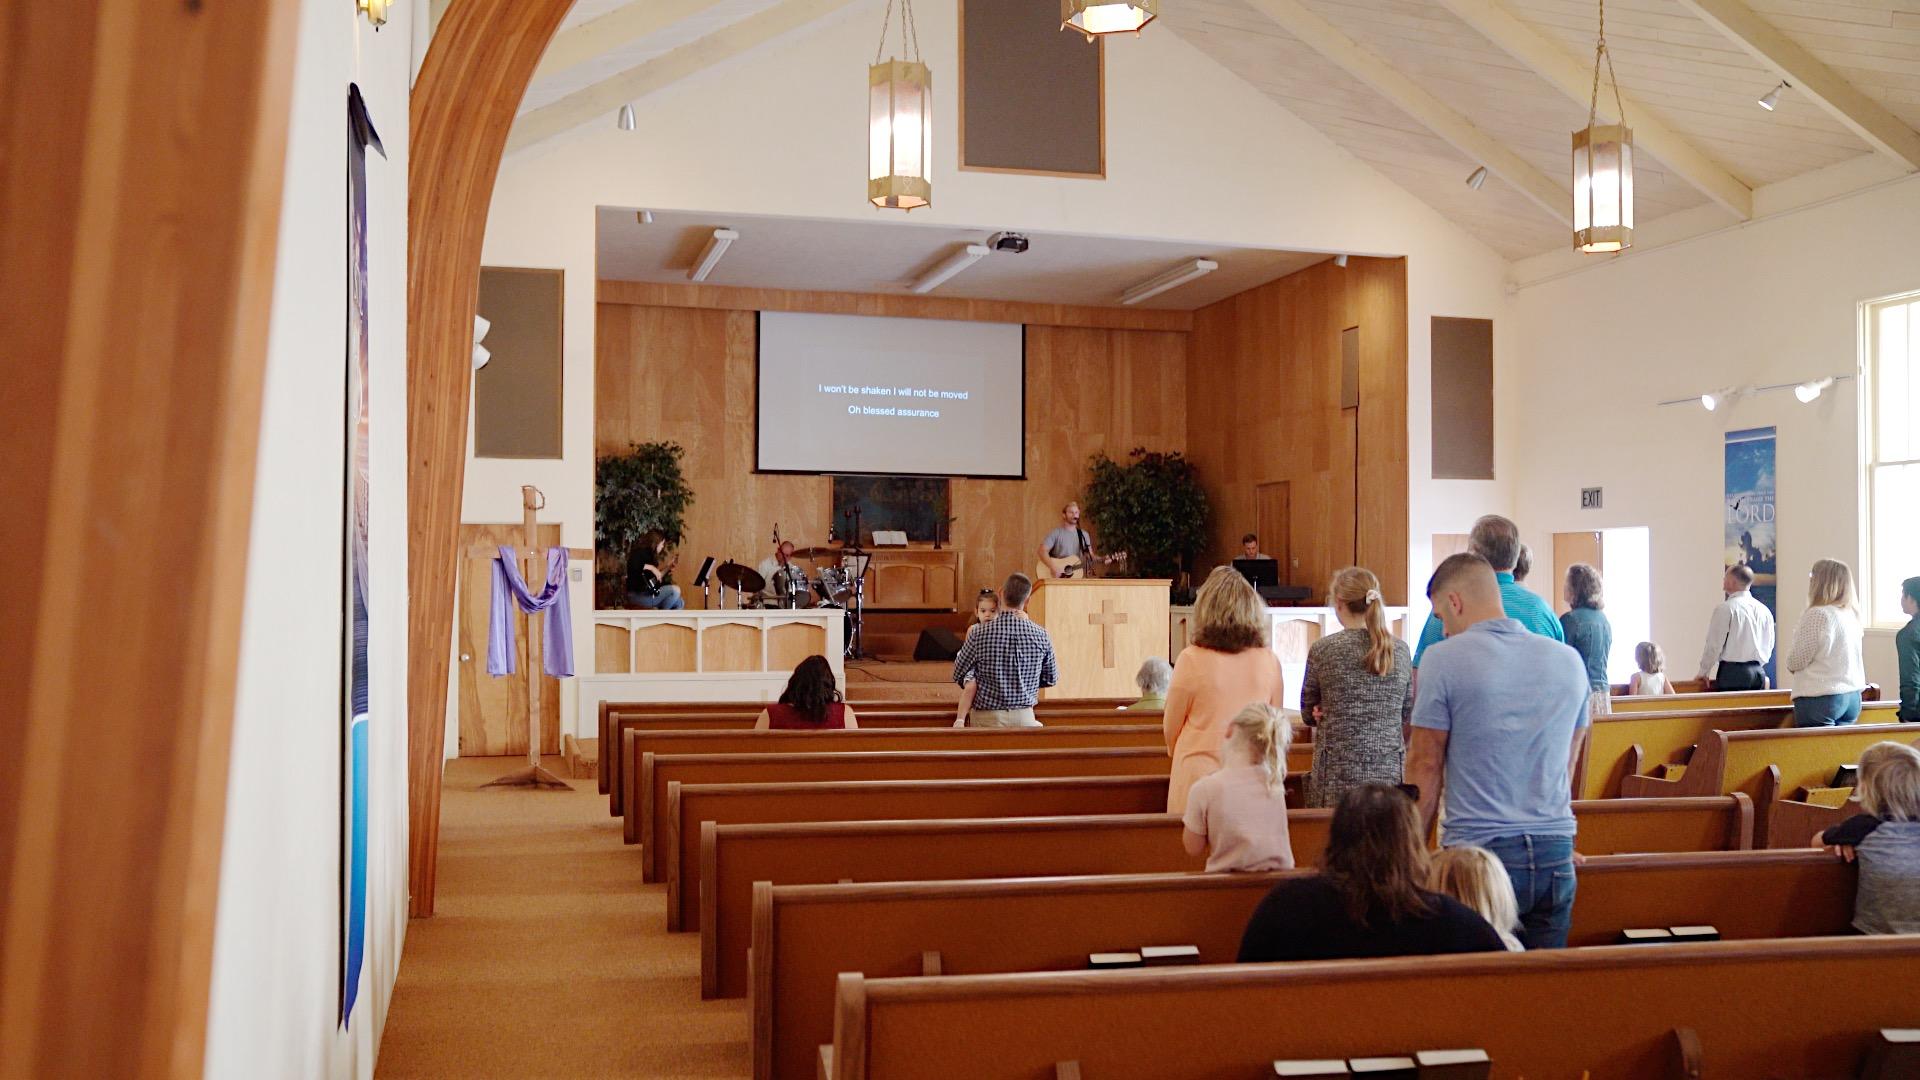 190915 Seaside First Baptist Worship Service.JPG